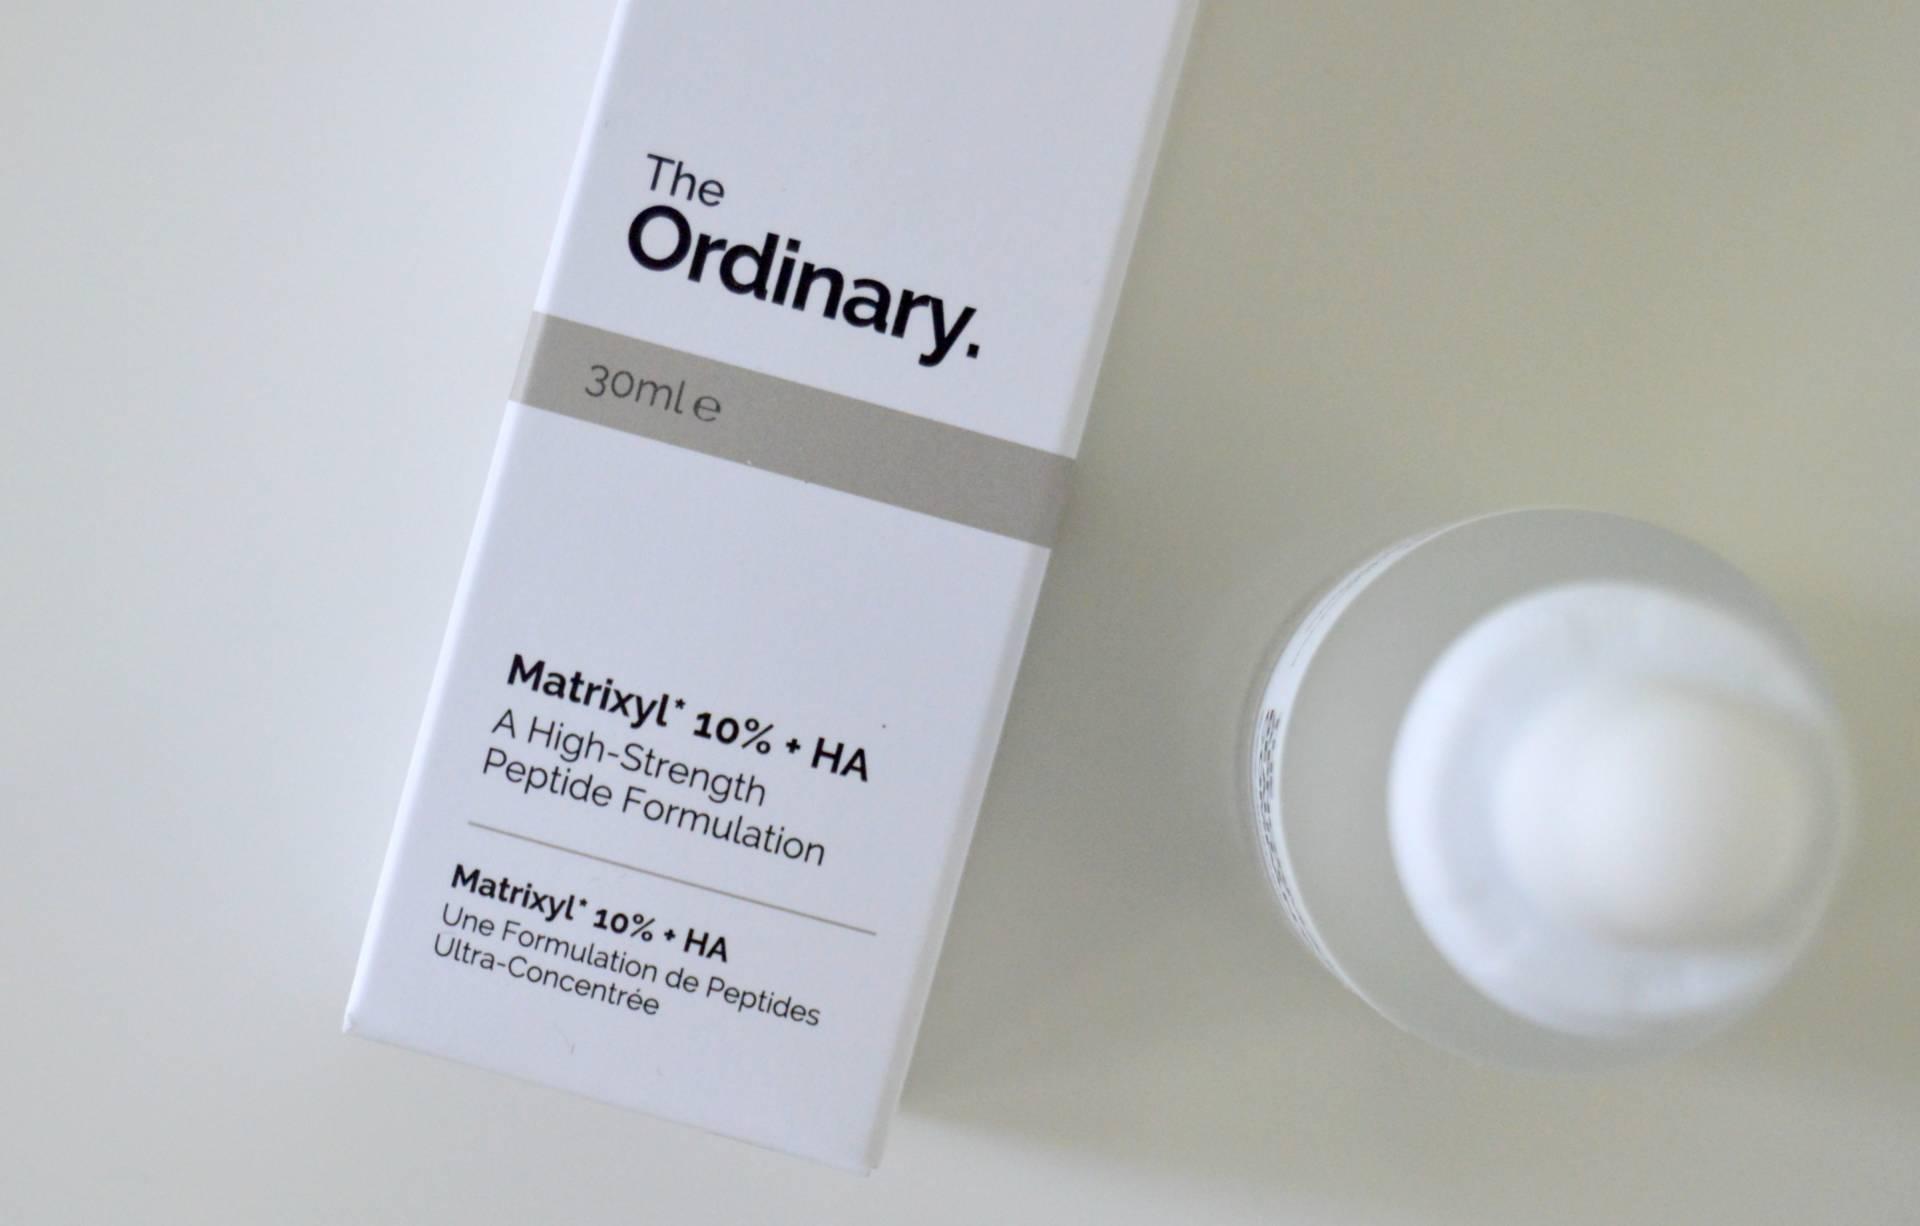 the-ordinary-matrixyl-hyaluronic-acid-serum-review-inhautepursuit